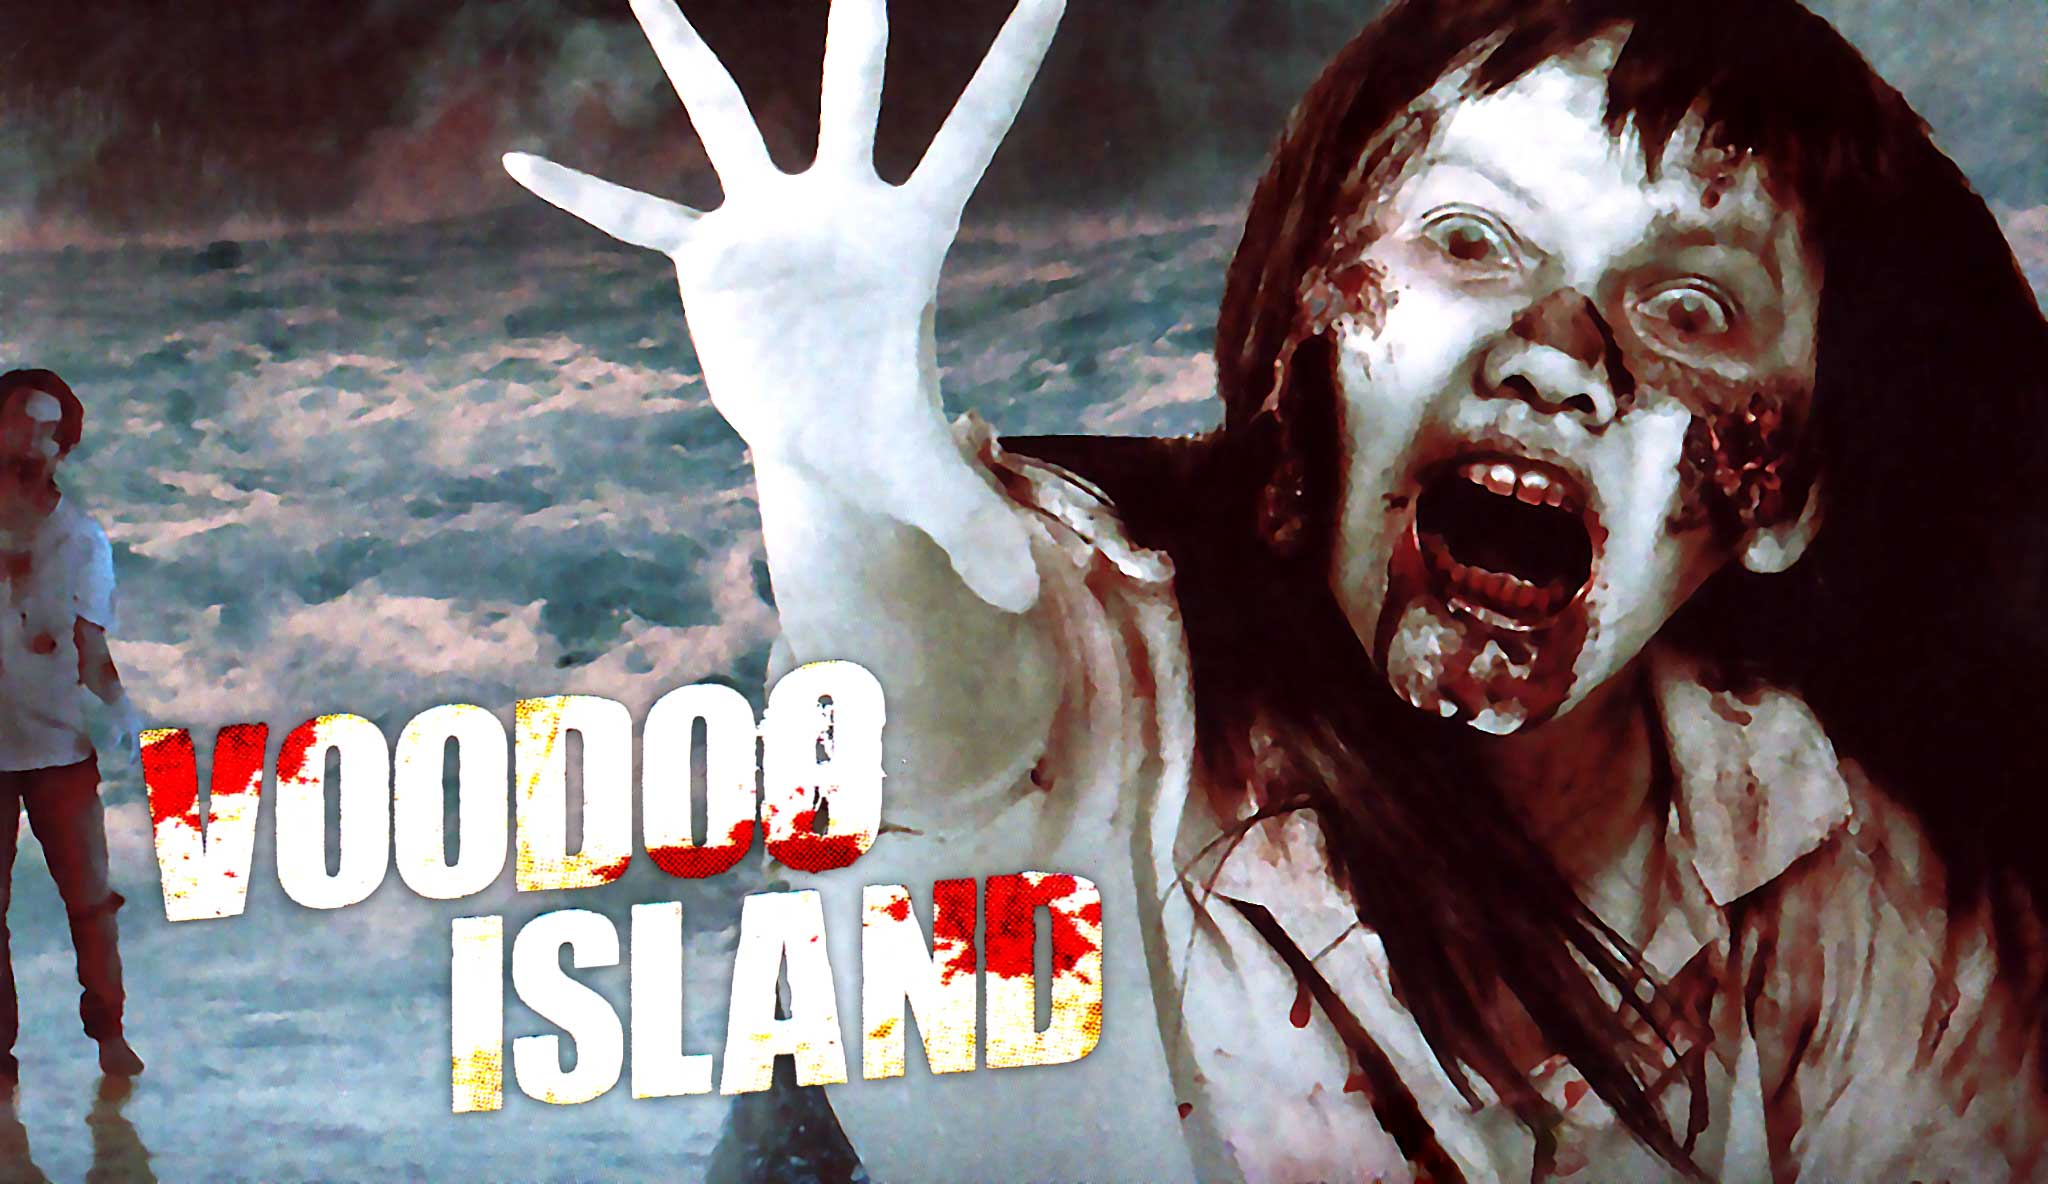 voodoo-island\header.jpg